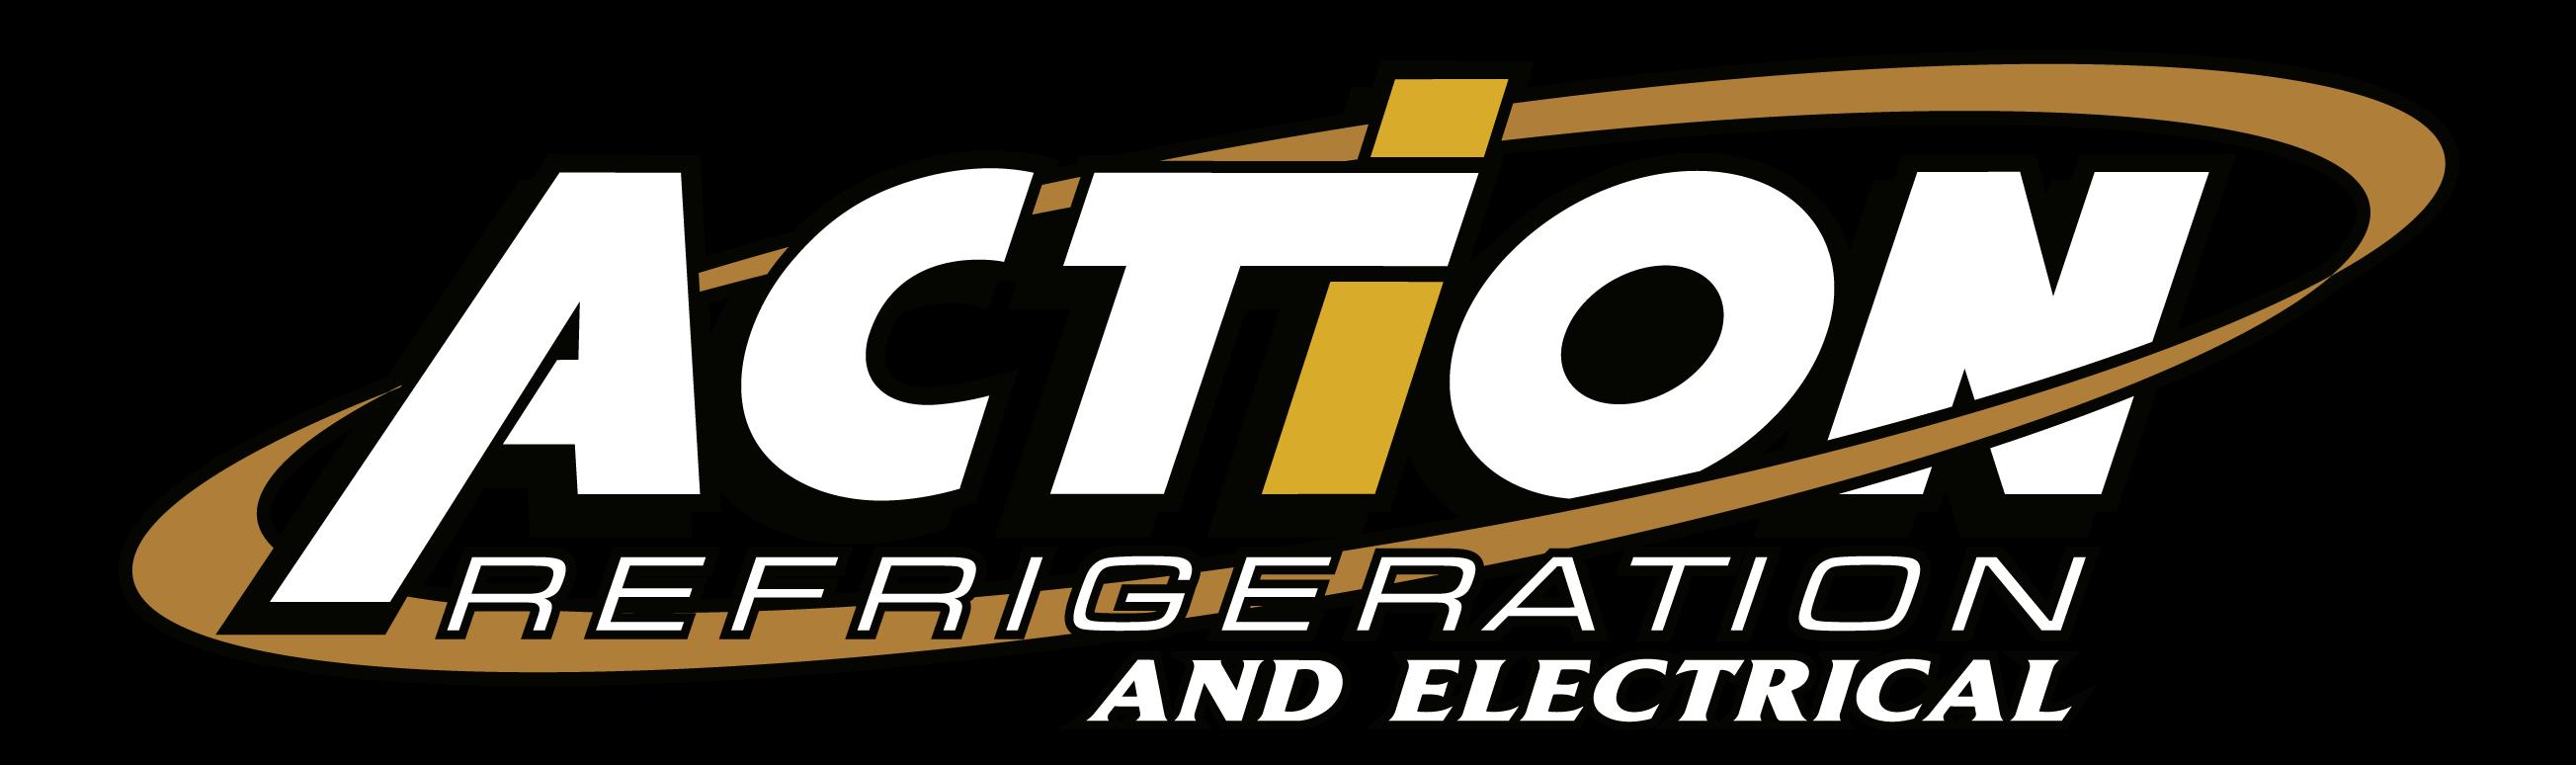 Plumber clipart maintenance supervisor. Hvac action refrigeration and